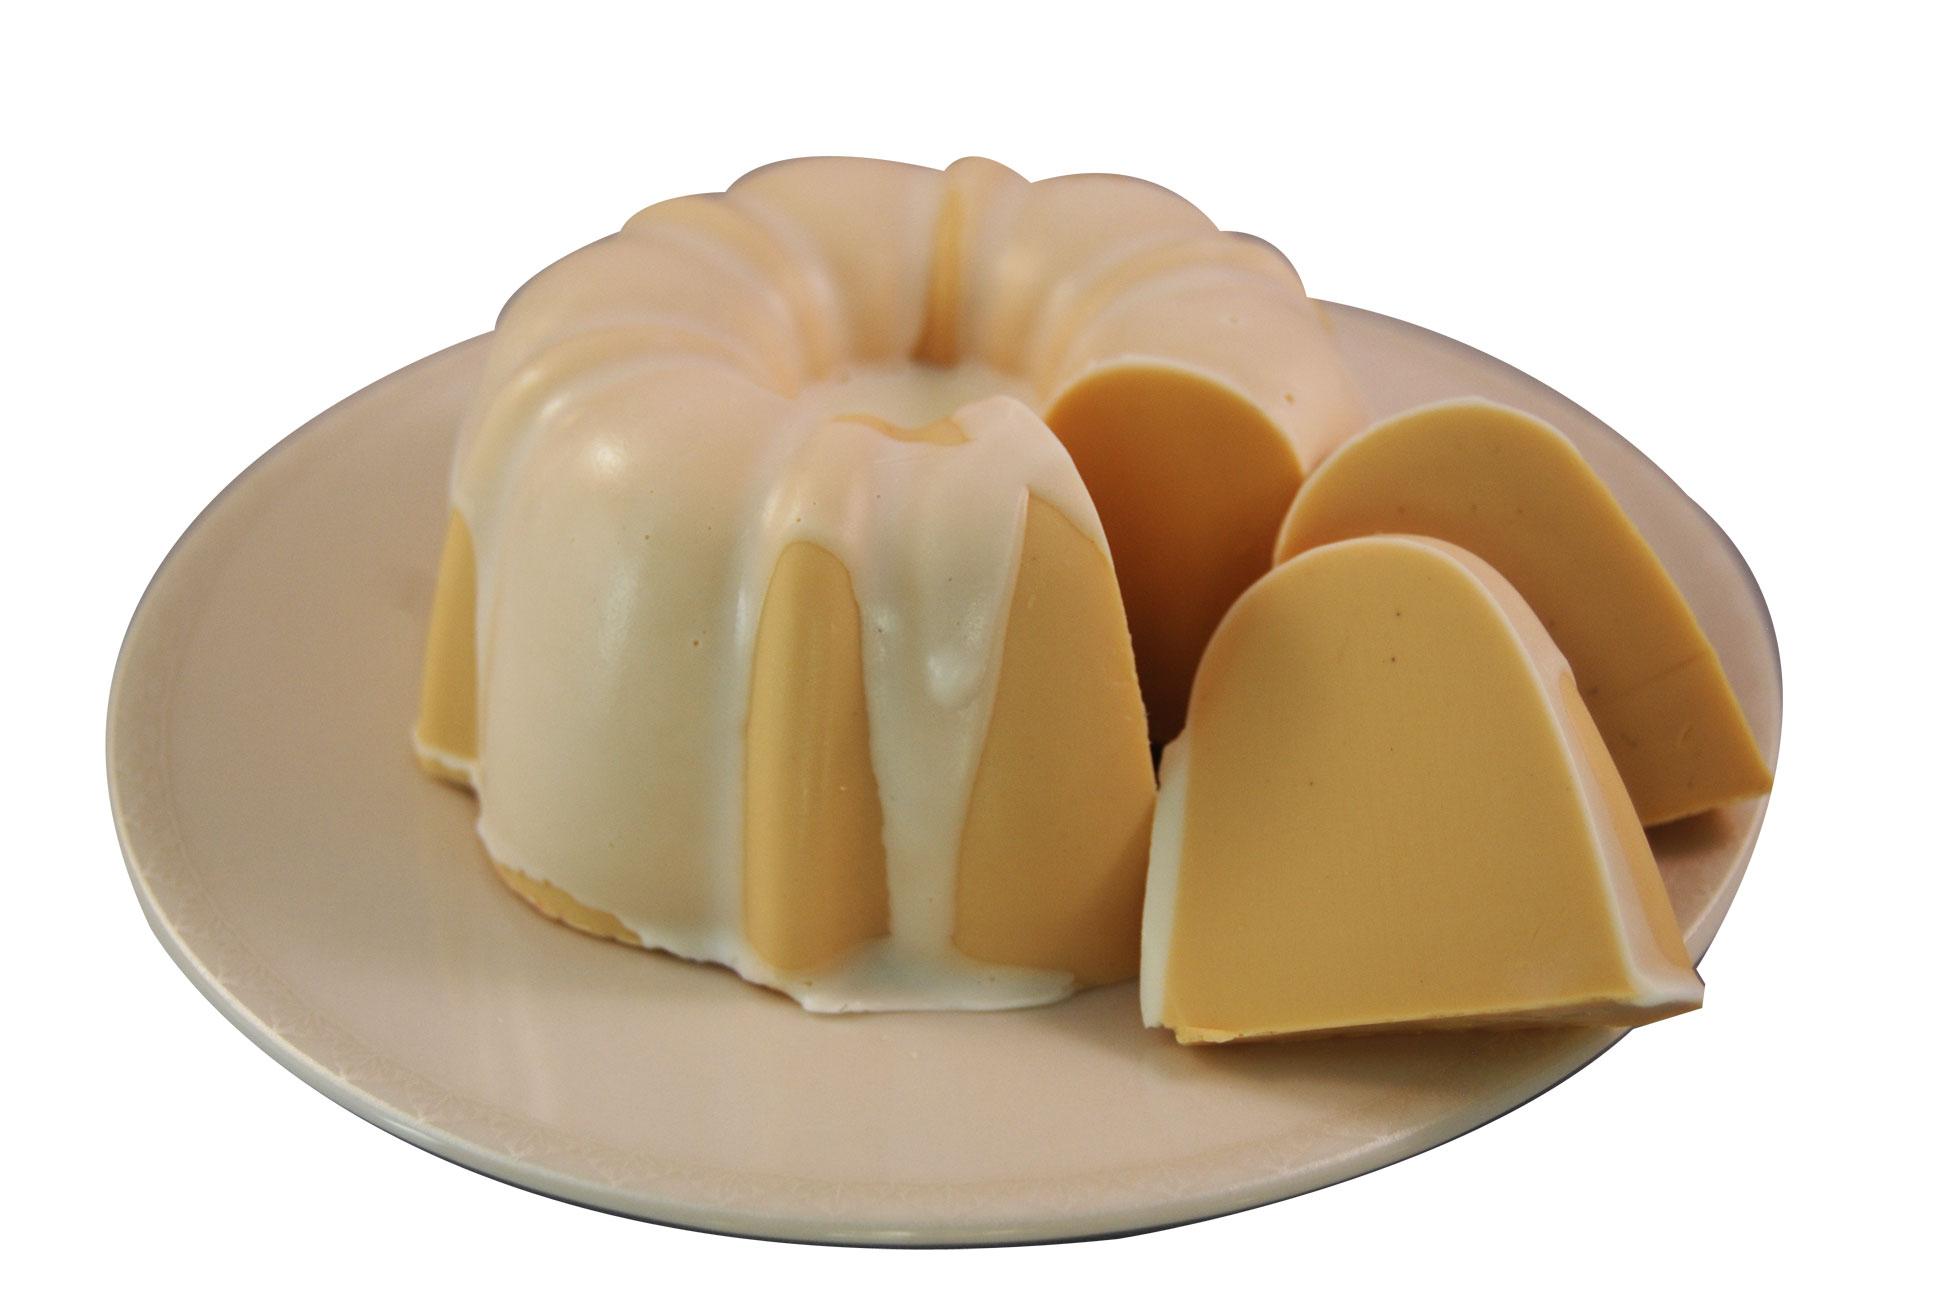 7up cake: